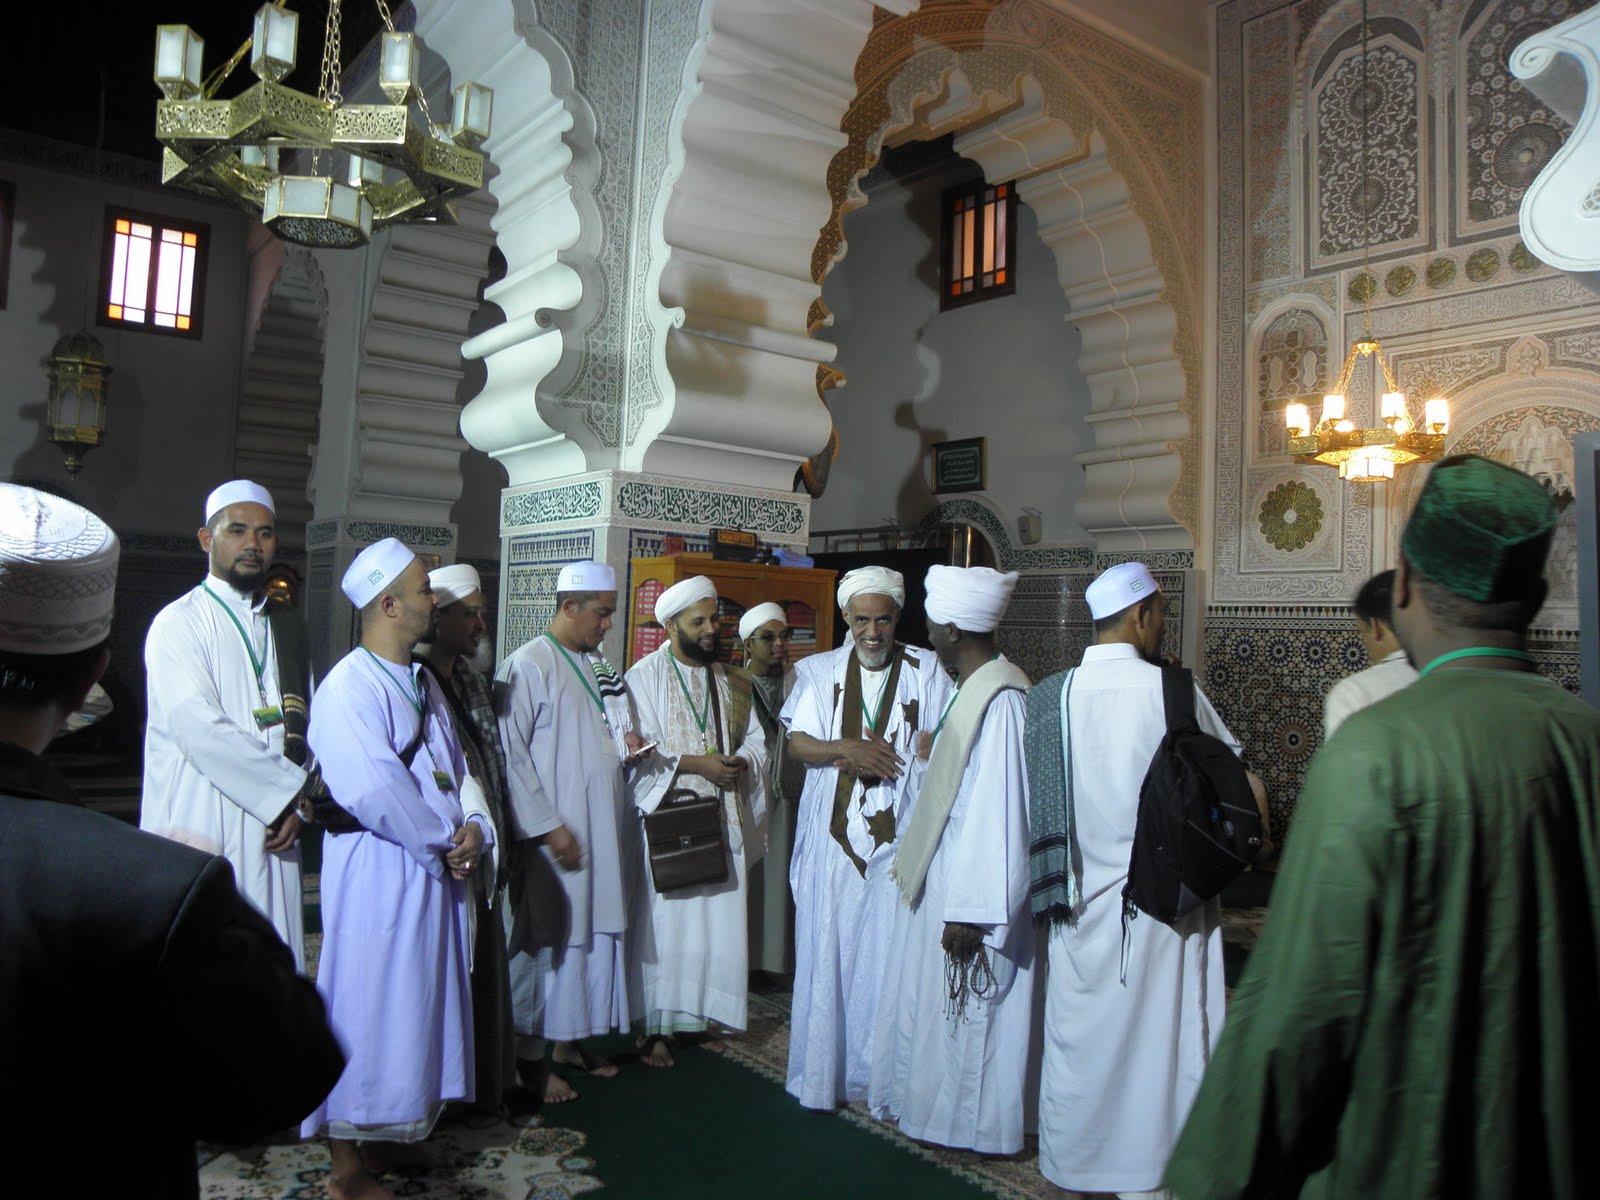 Grand Zawiya, Fez, Morocco - 2009